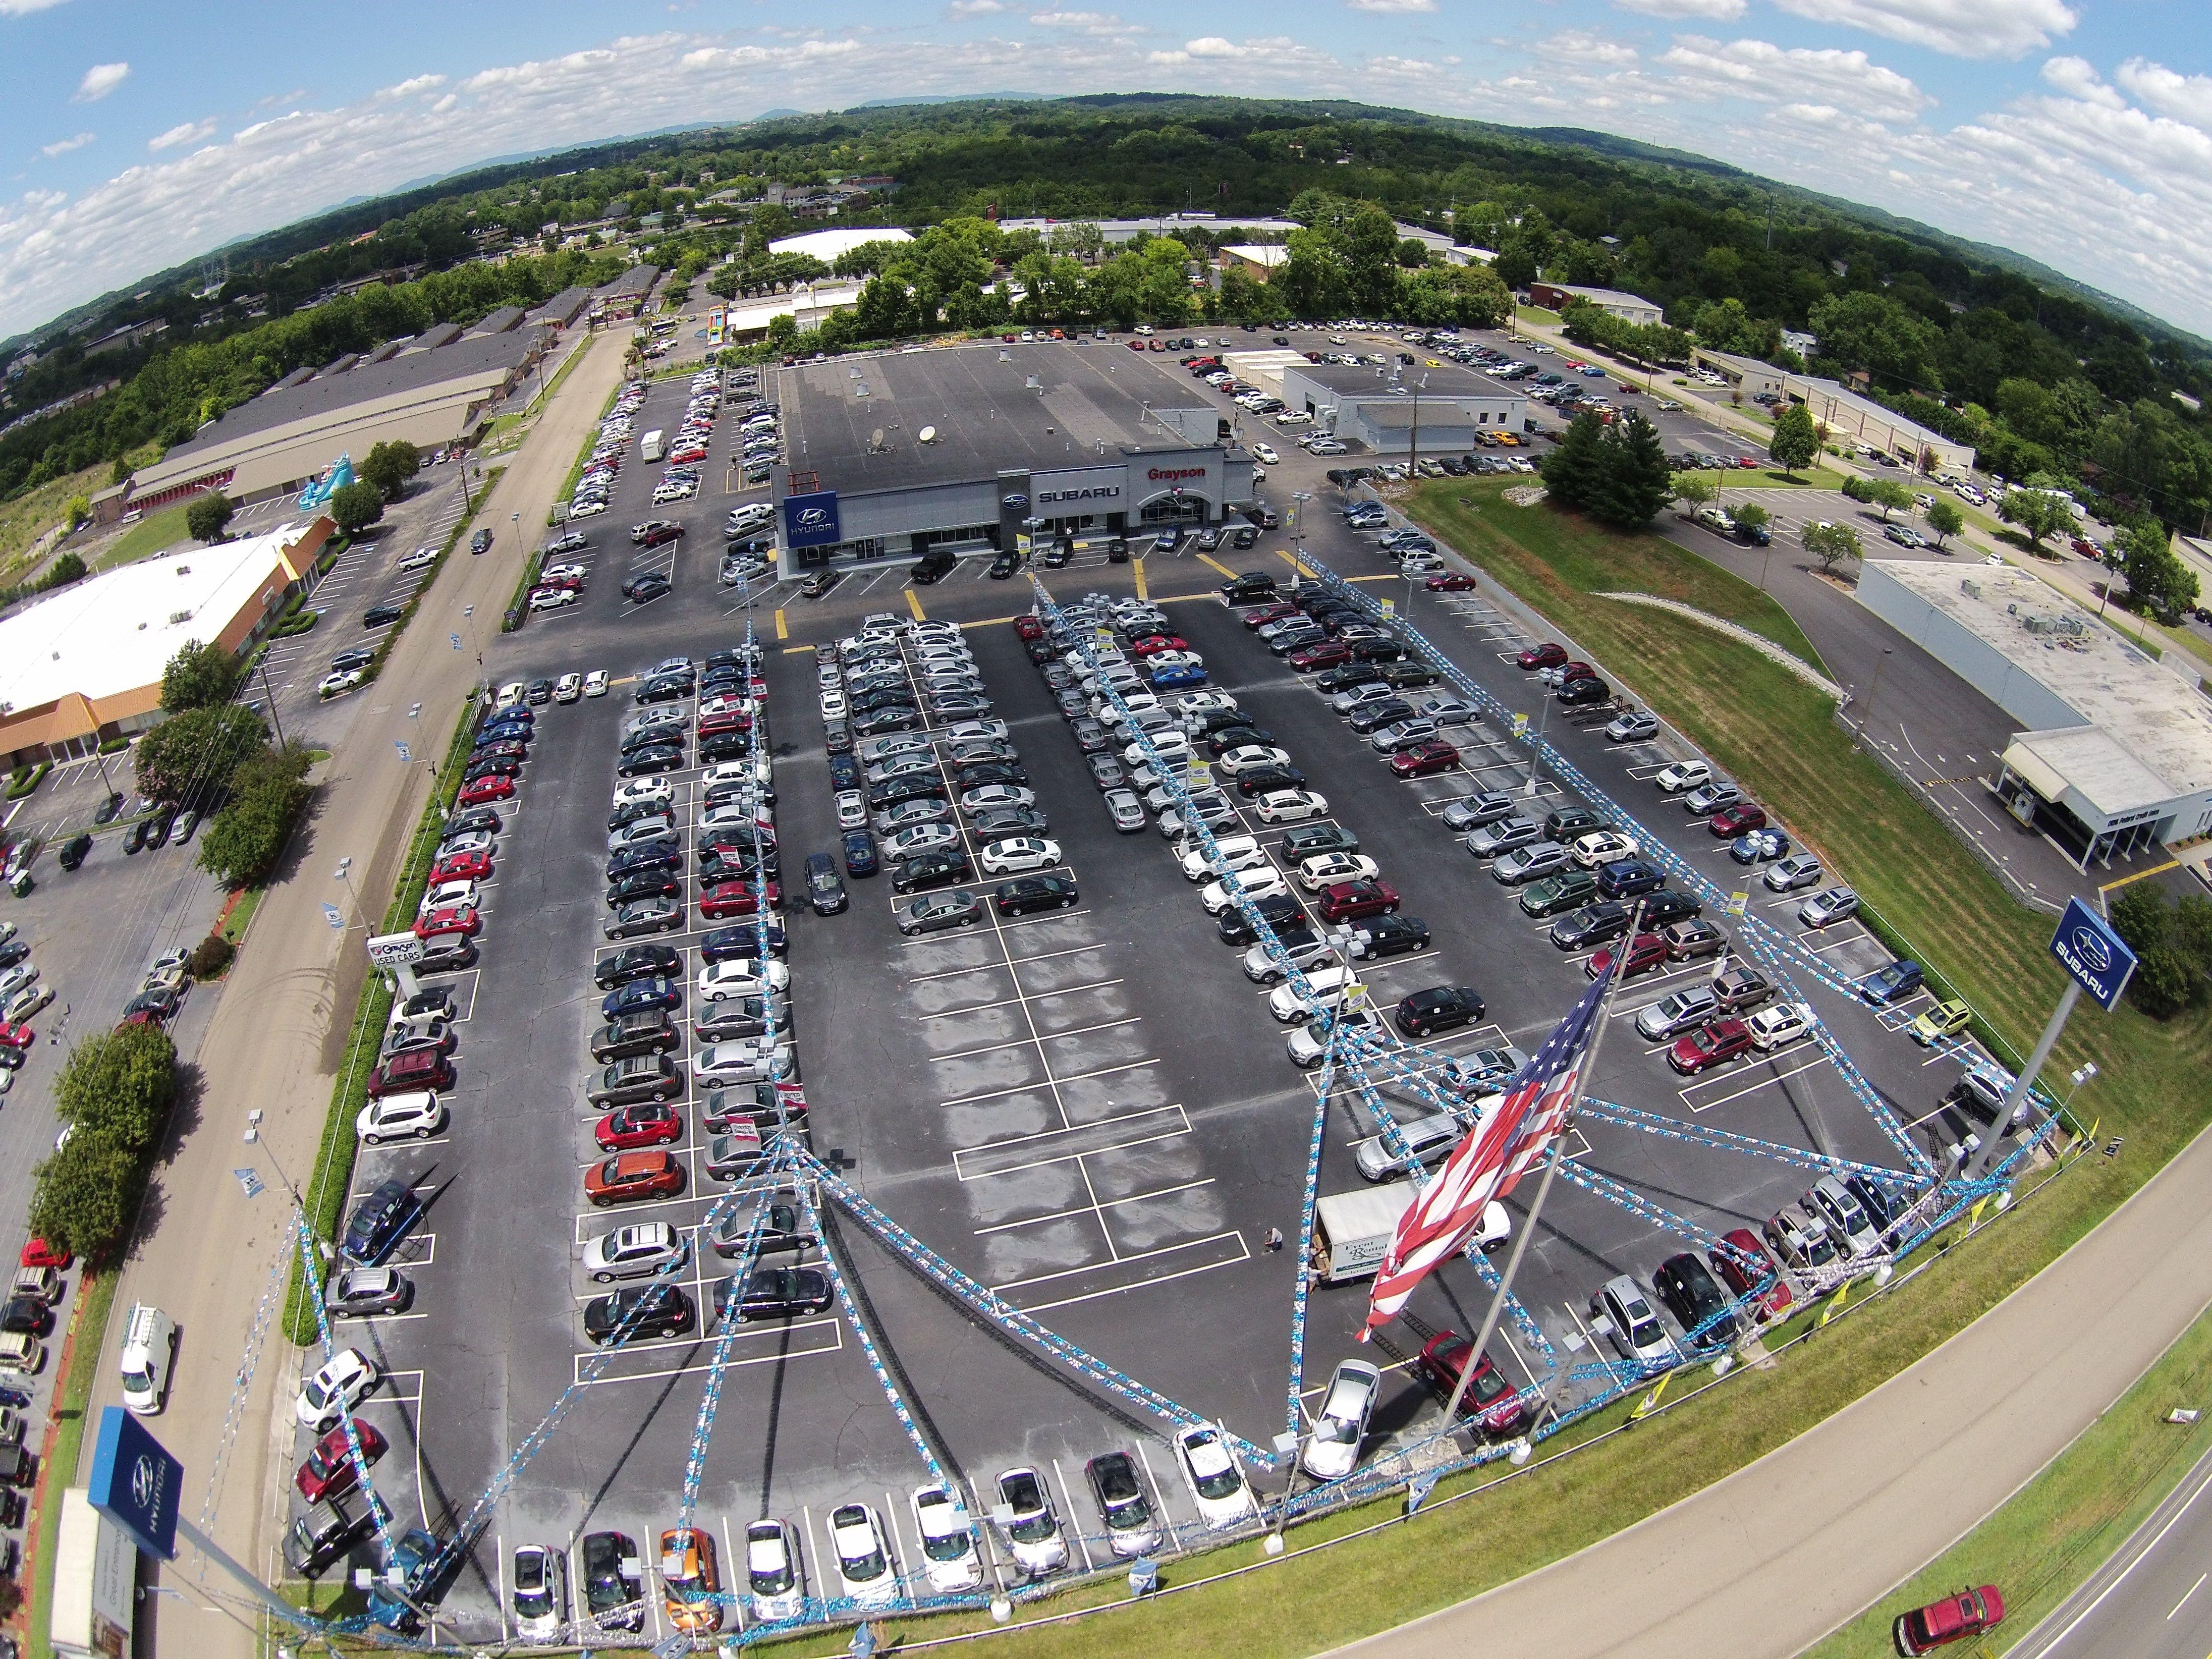 Grayson Hyundai Knoxville Tn >> Grayson Hyundai 8729 Kingston Pike Knoxville Tn 37923 Yp Com